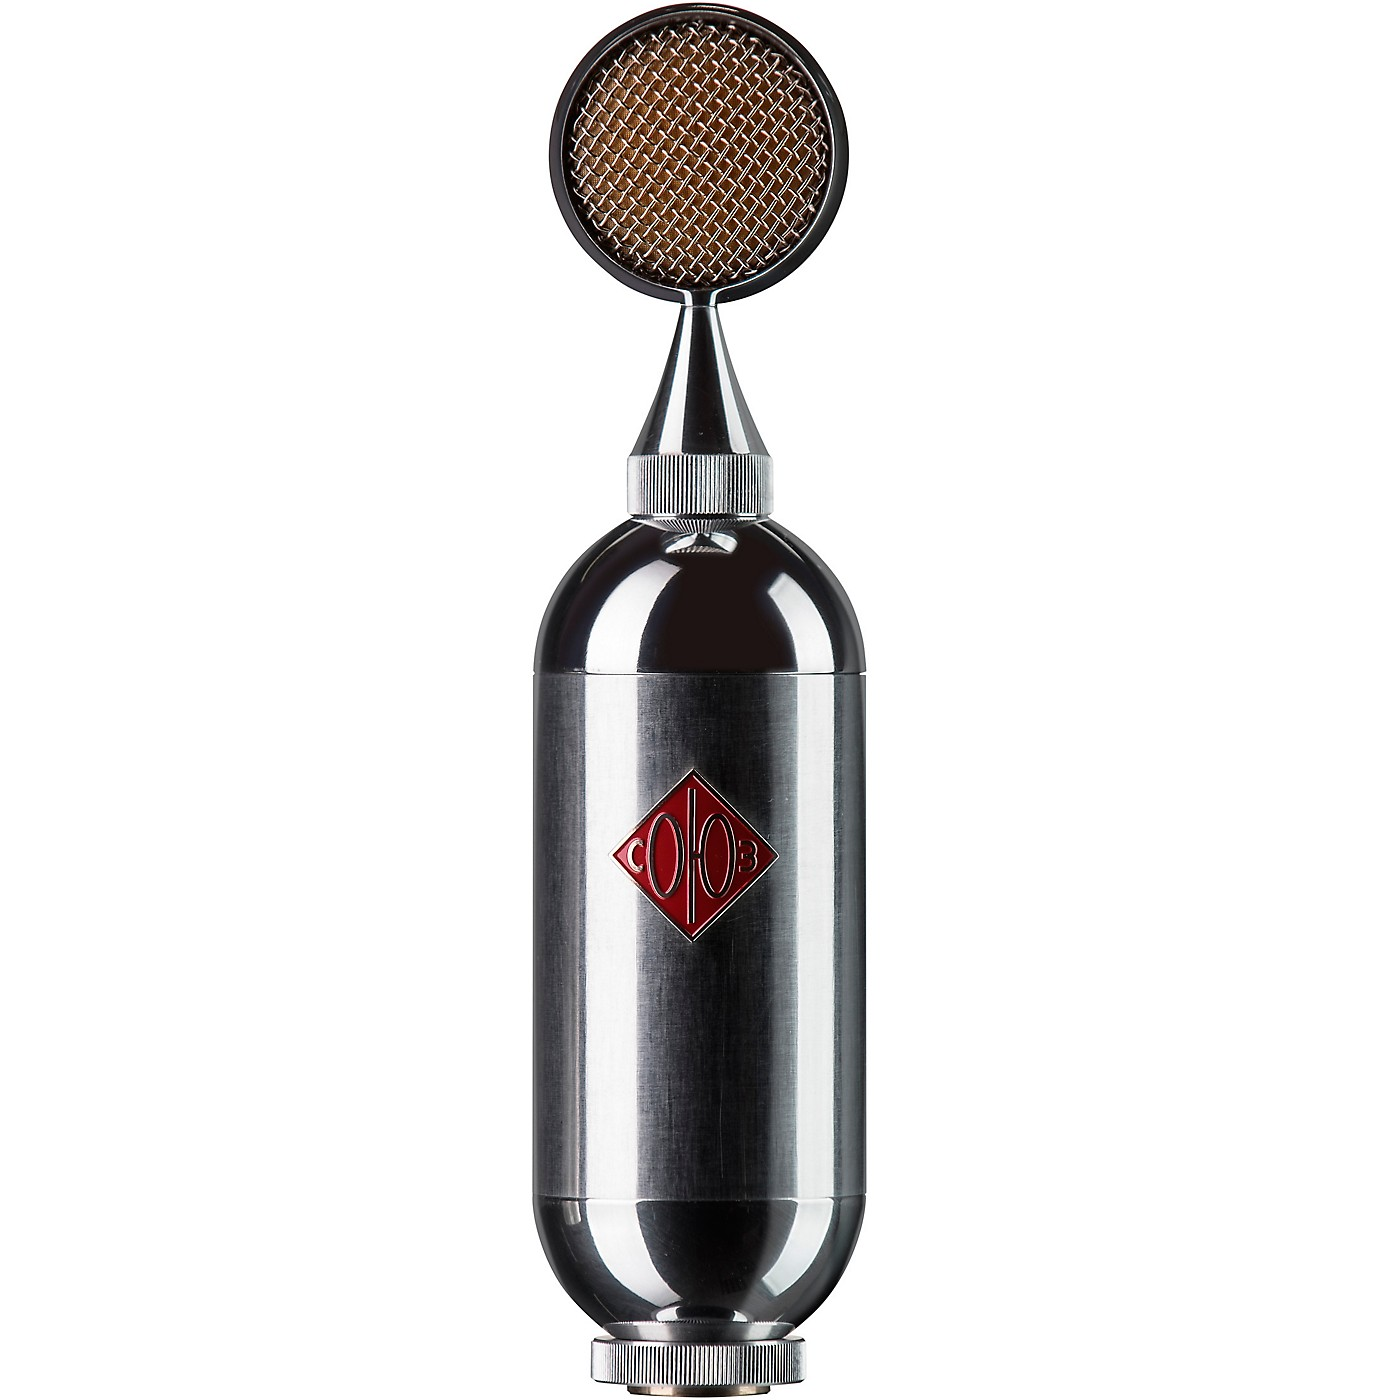 Soyuz Microphones 023 BOMBLET Large diaphragm FET Microphone (cardioid capsule, -20dB pad, mic holder) thumbnail